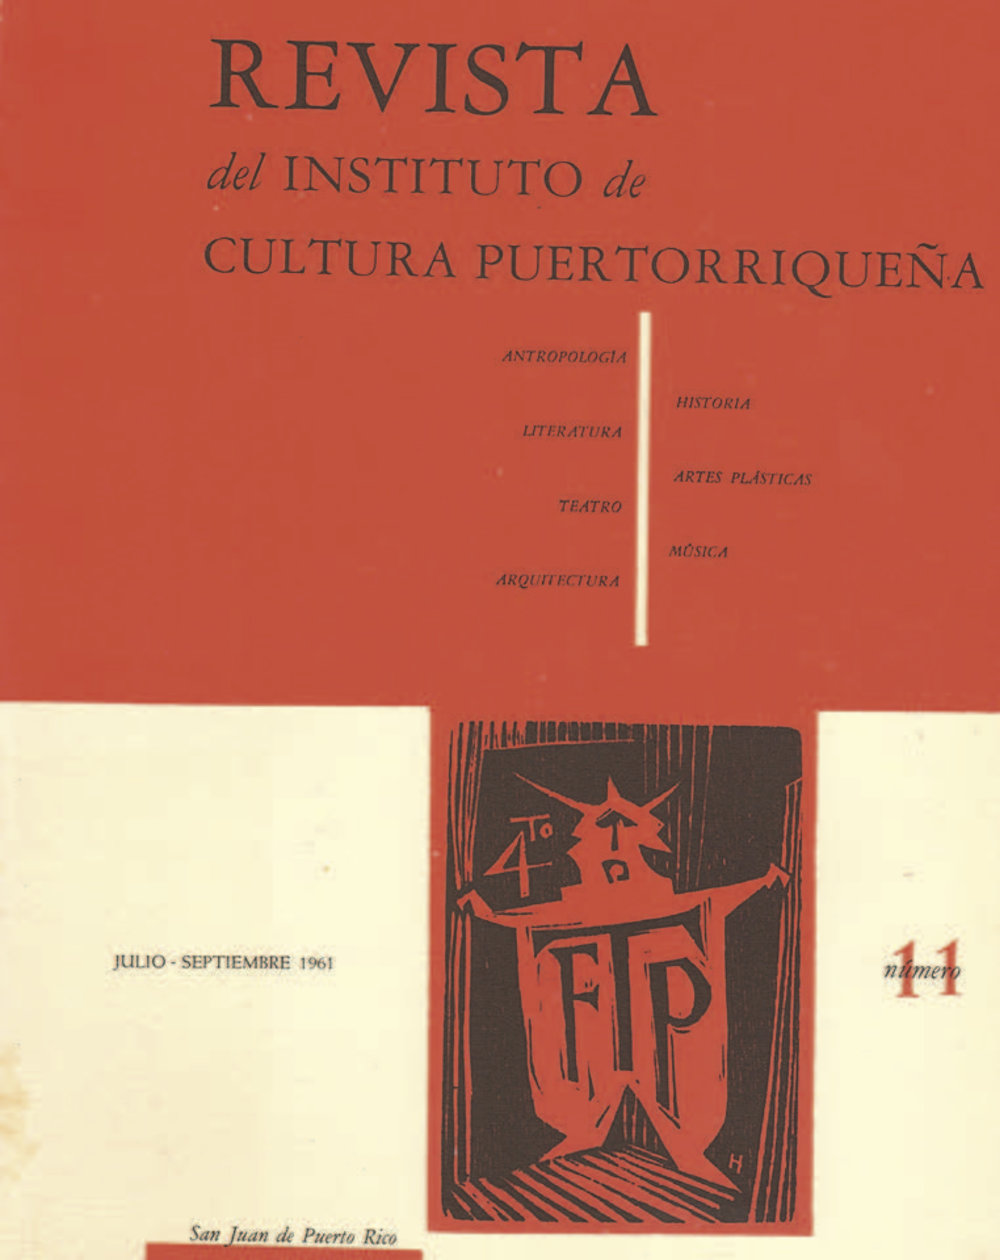 Número 11 / 1961